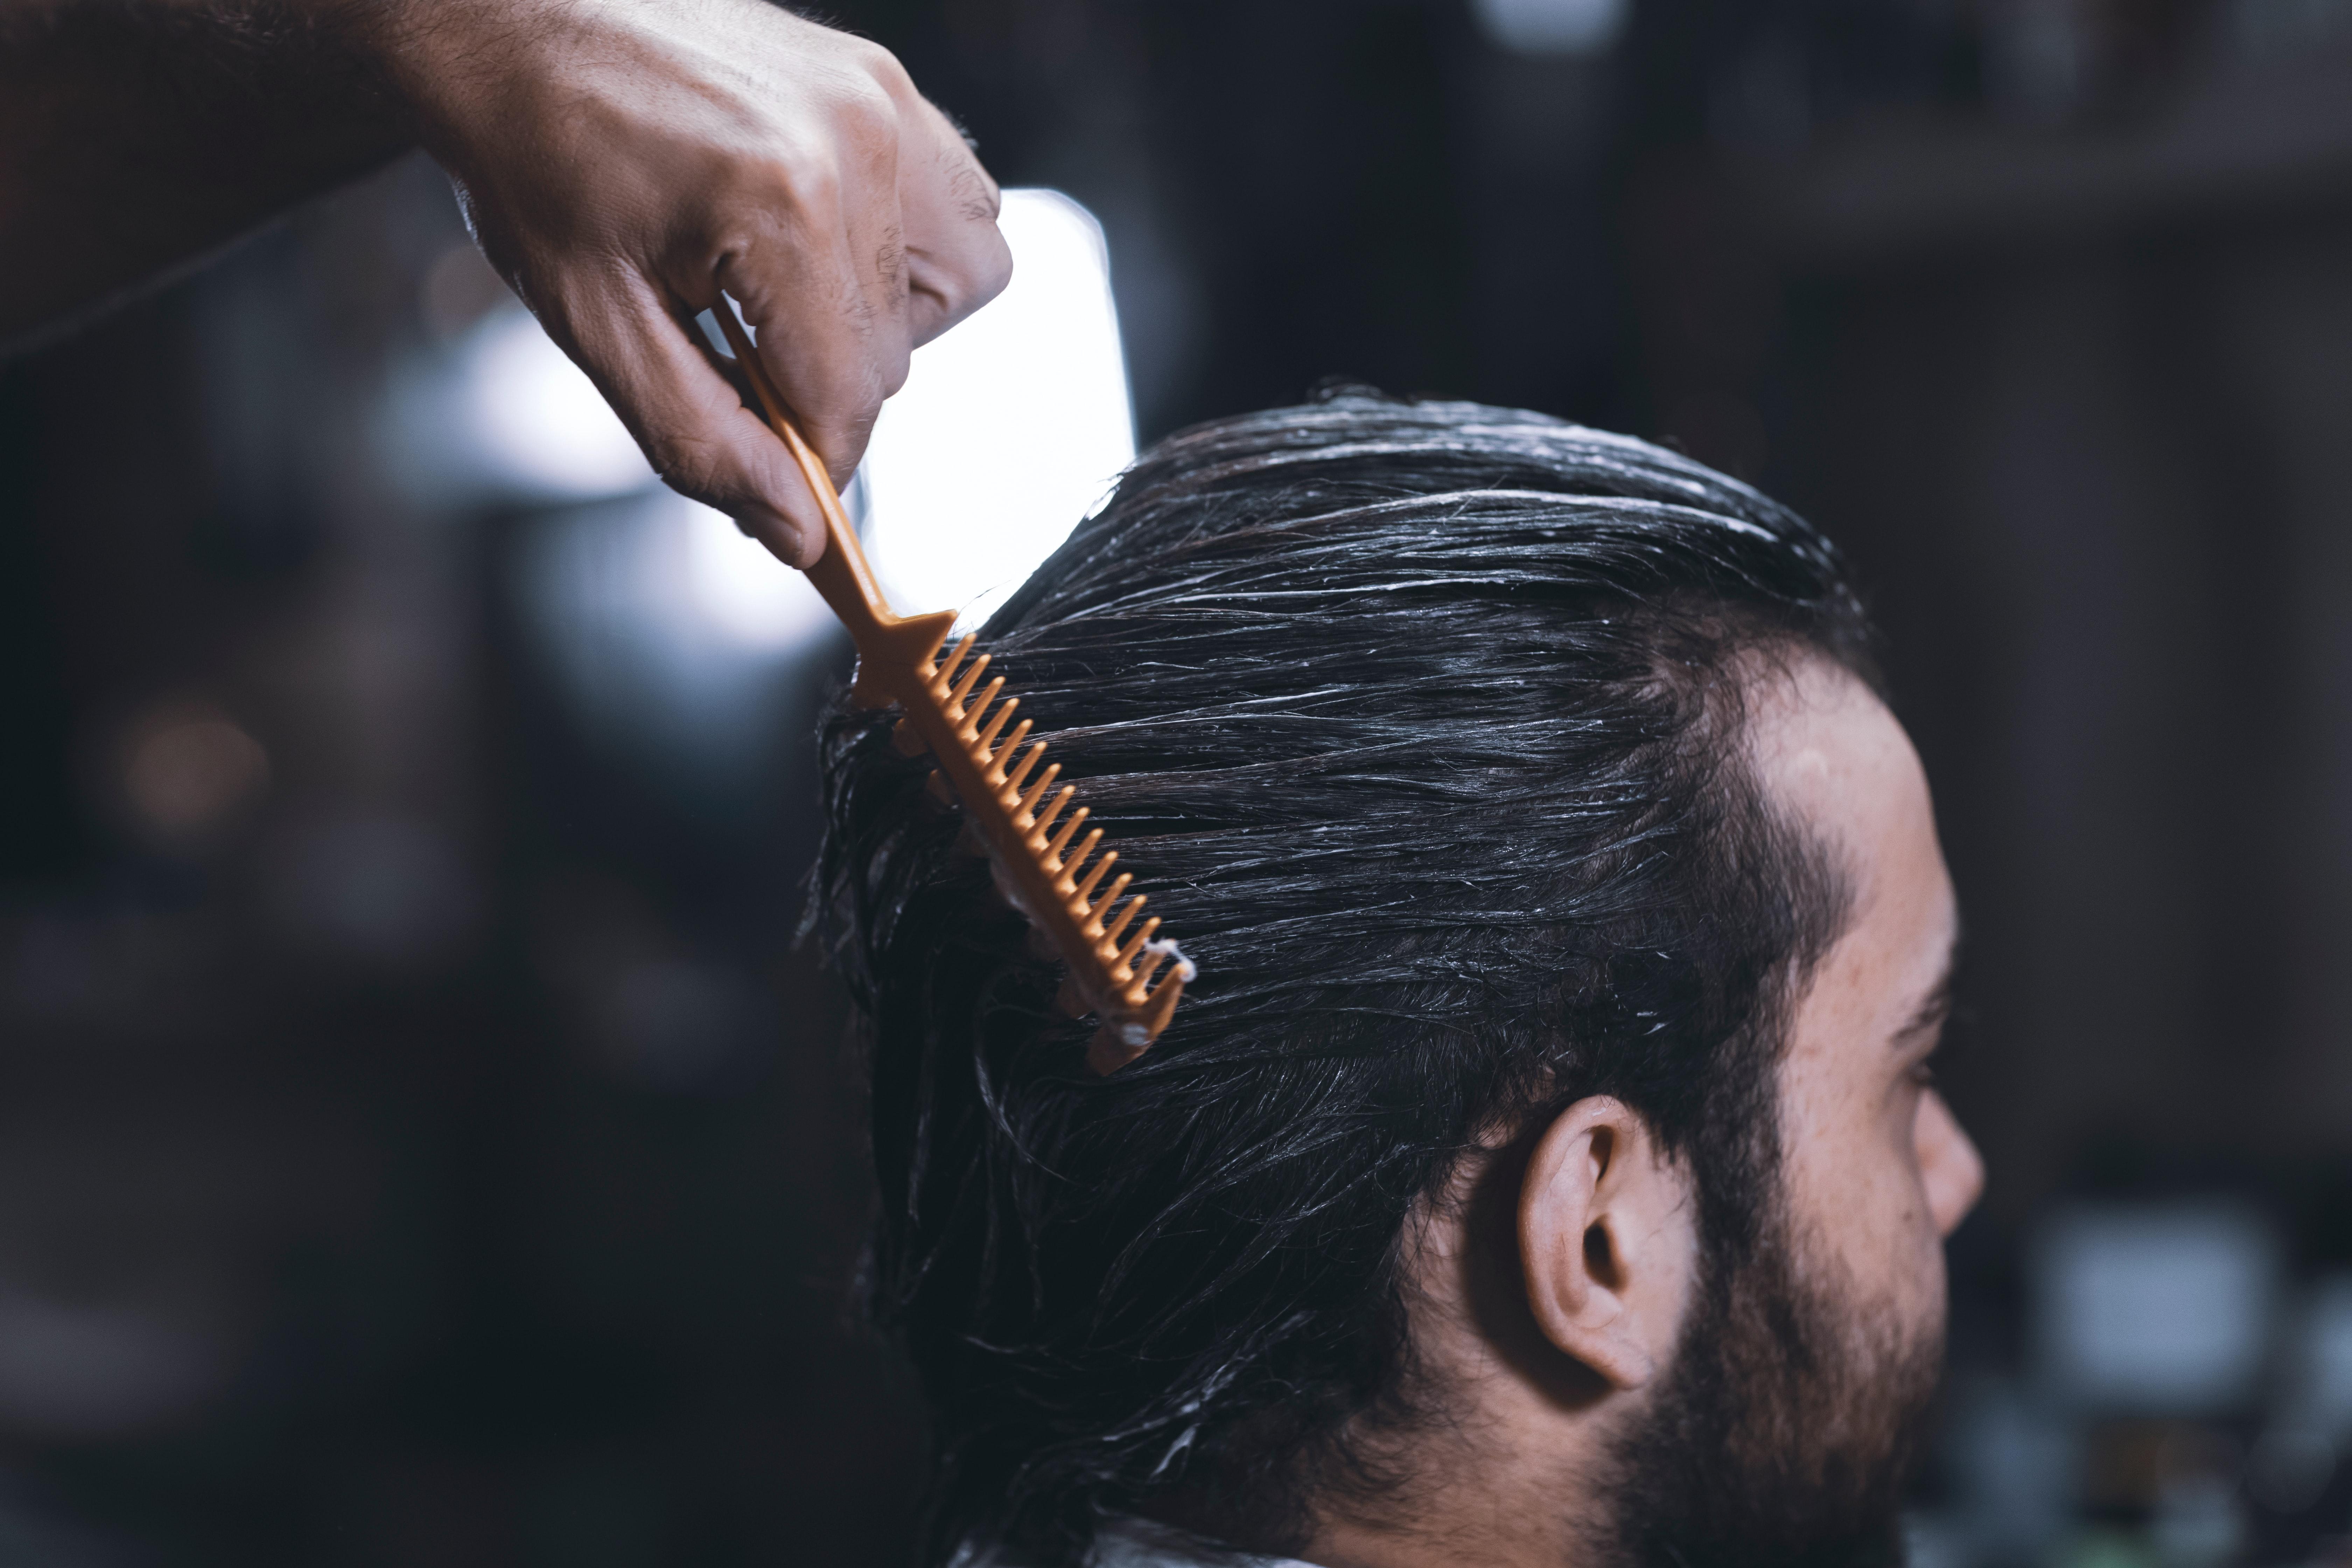 Hair Getting Damaged